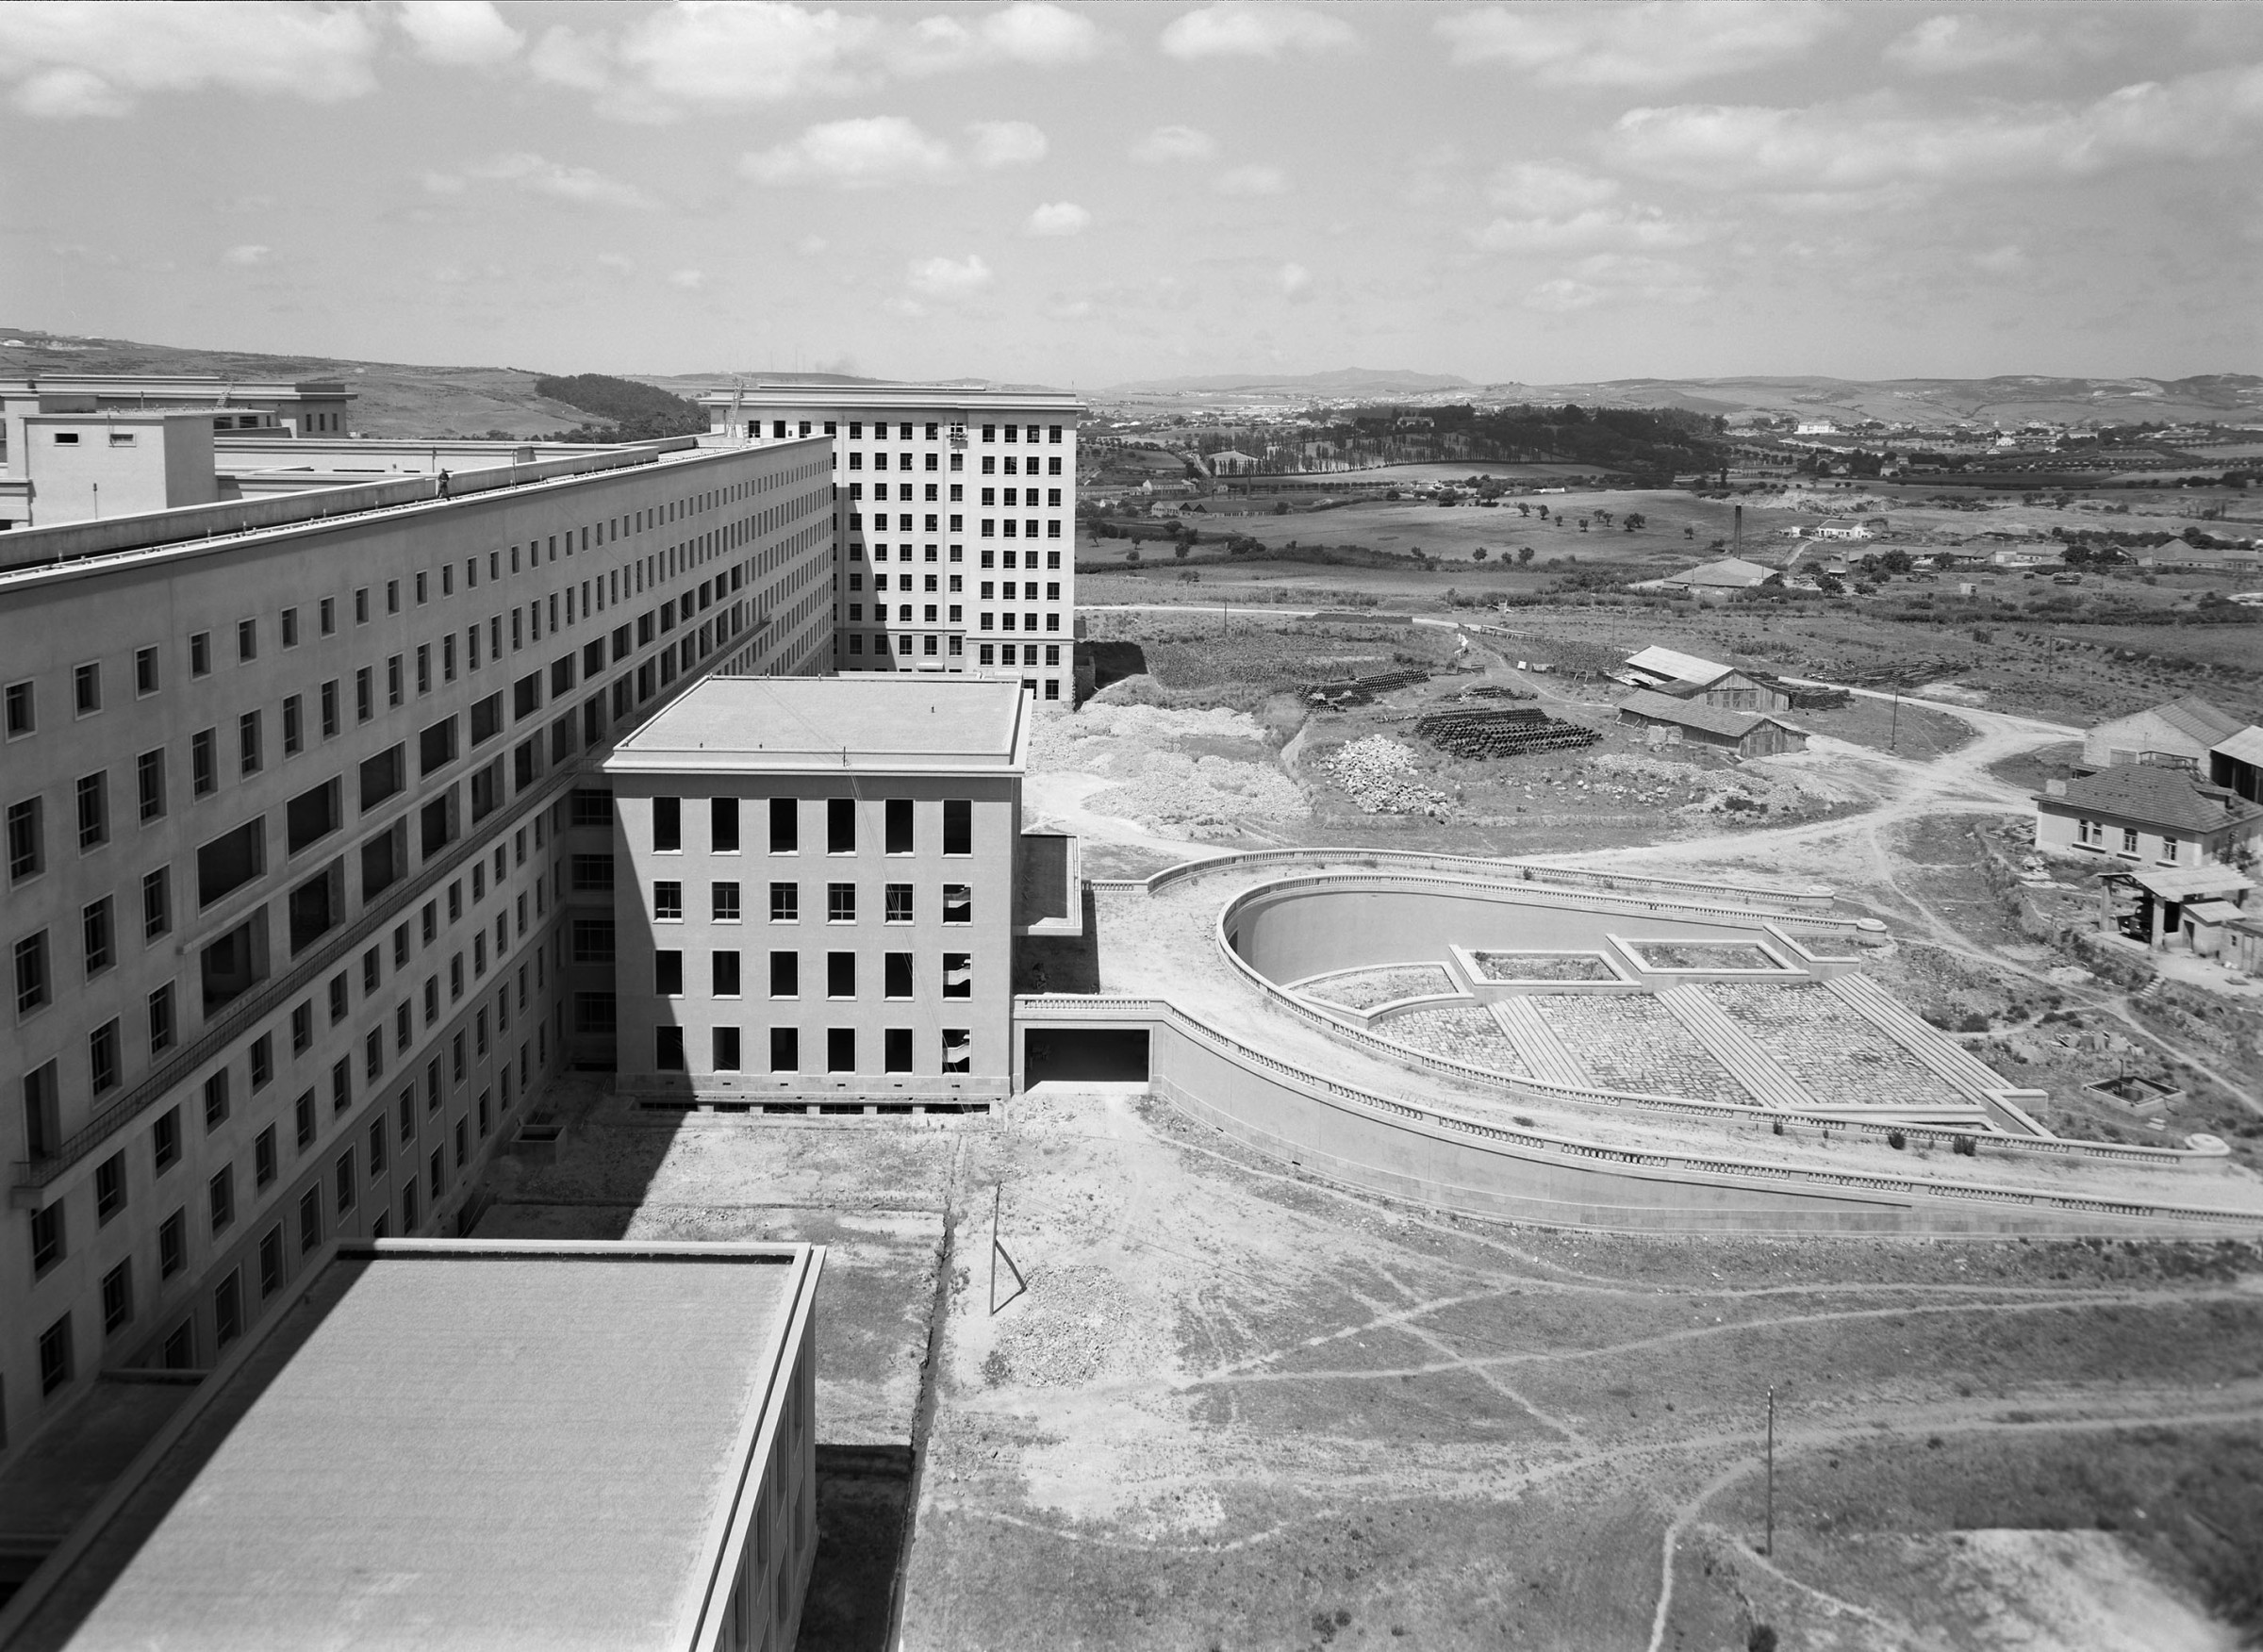 06-construc3a7c3a3o-hsm-1950.jpg